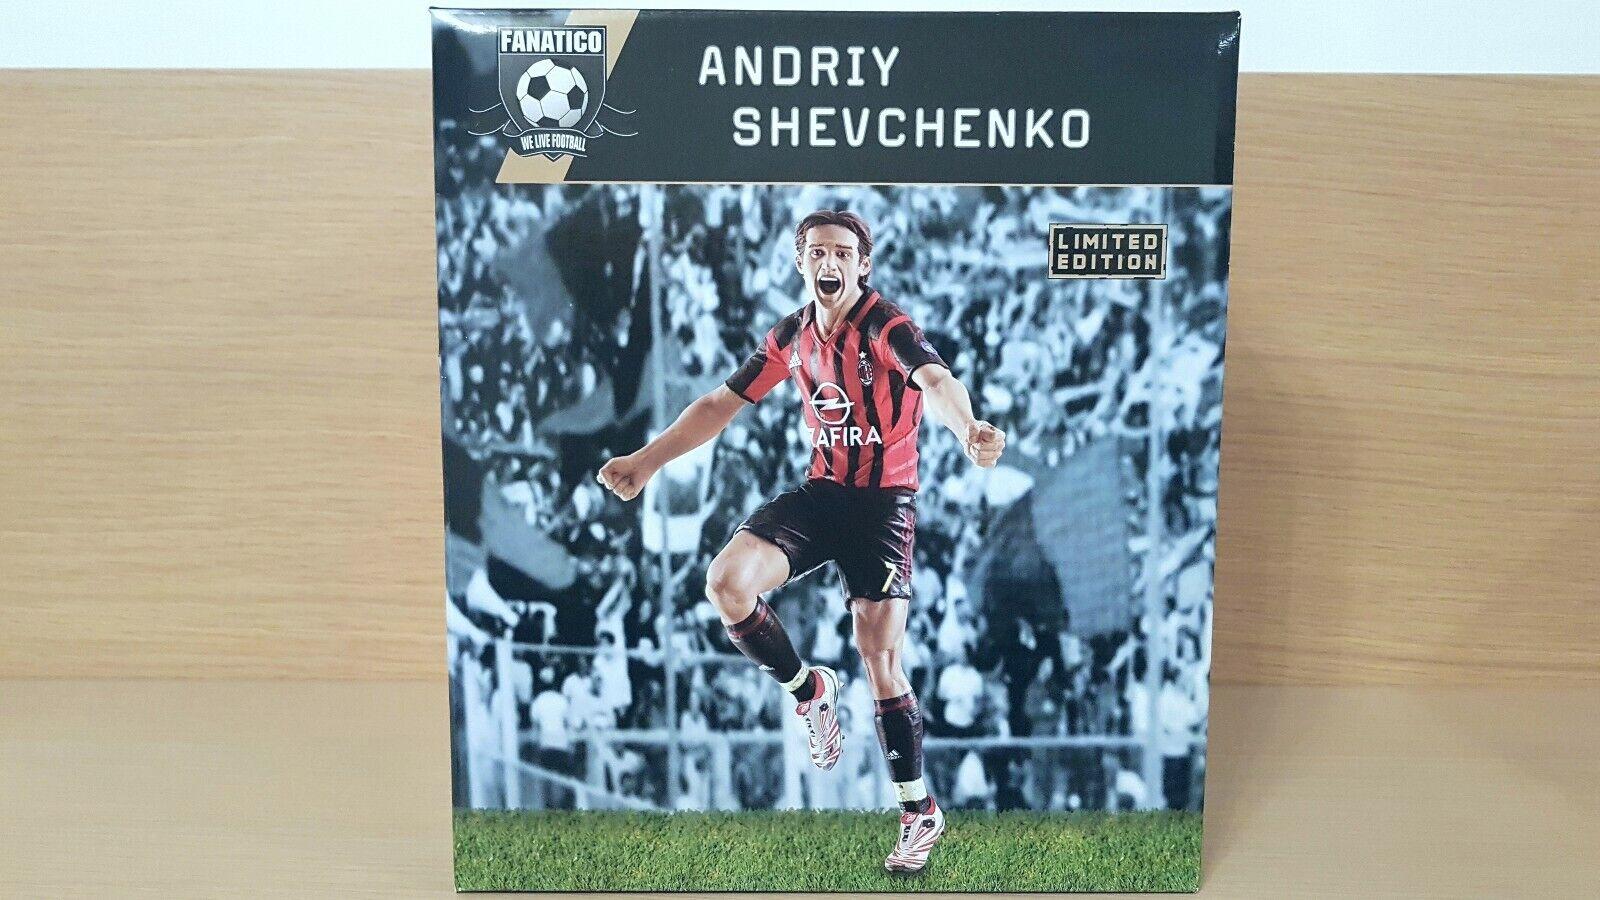 Fanatico Figures Andriy Shevchenko PROMO 32 pcs. scala 1 9 Limited Edition